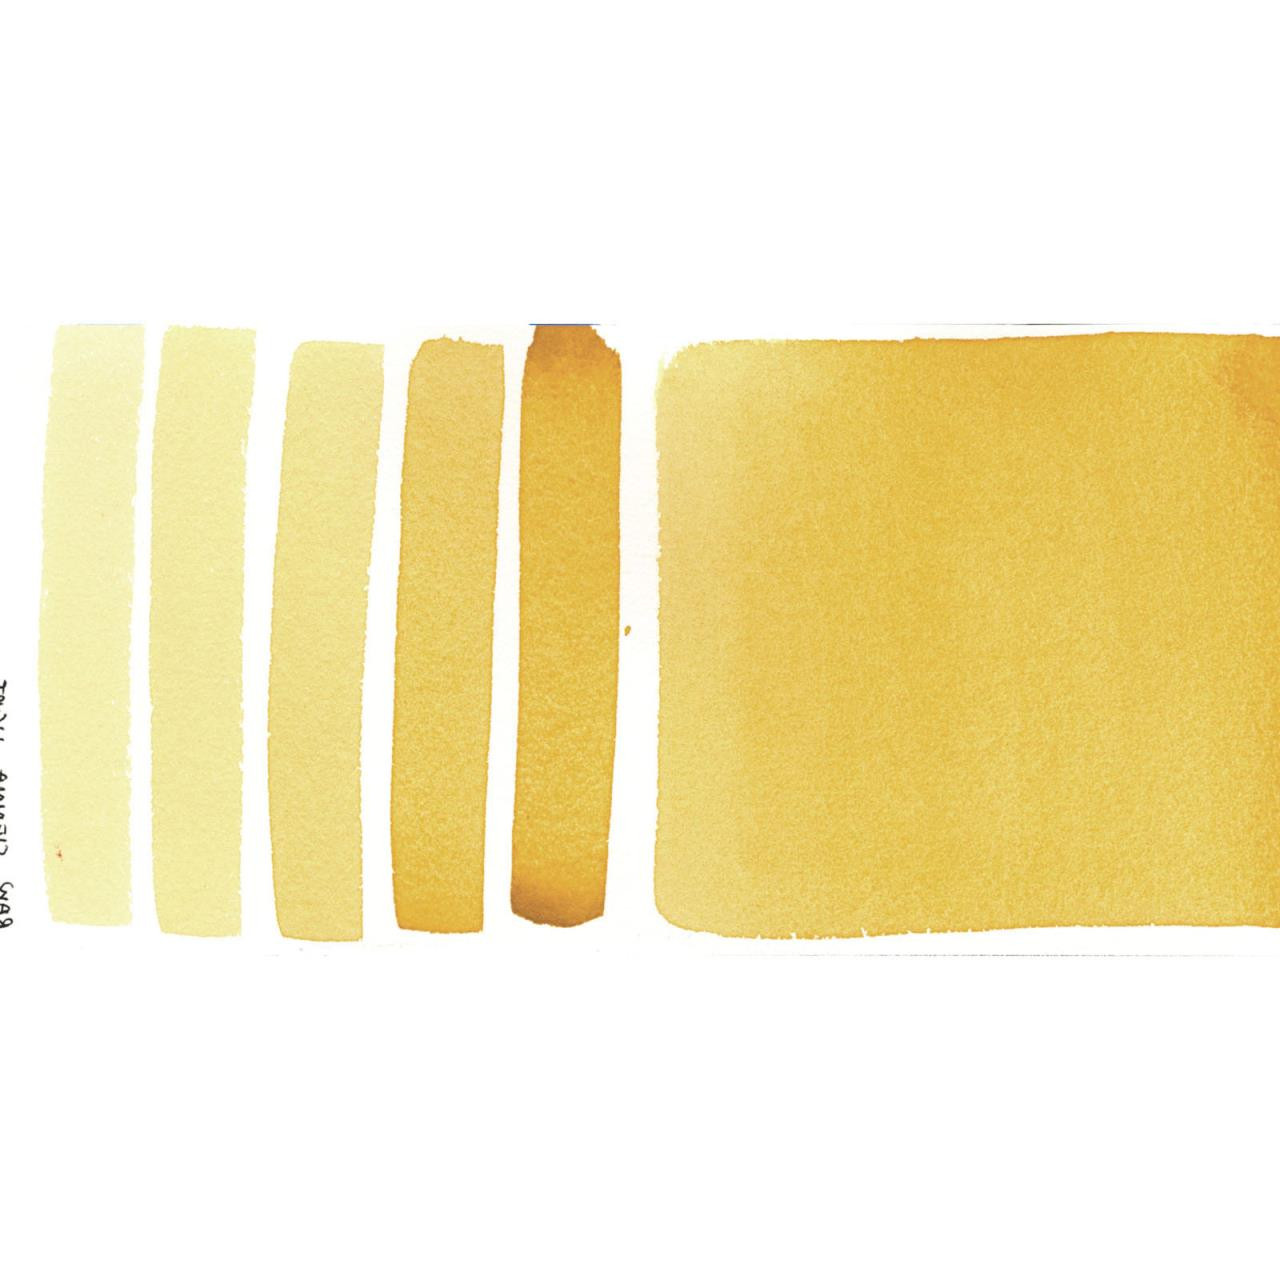 Raw Sienna Light, DANIEL SMITH Extra Fine Watercolors 15ml Tubes - 743162033355